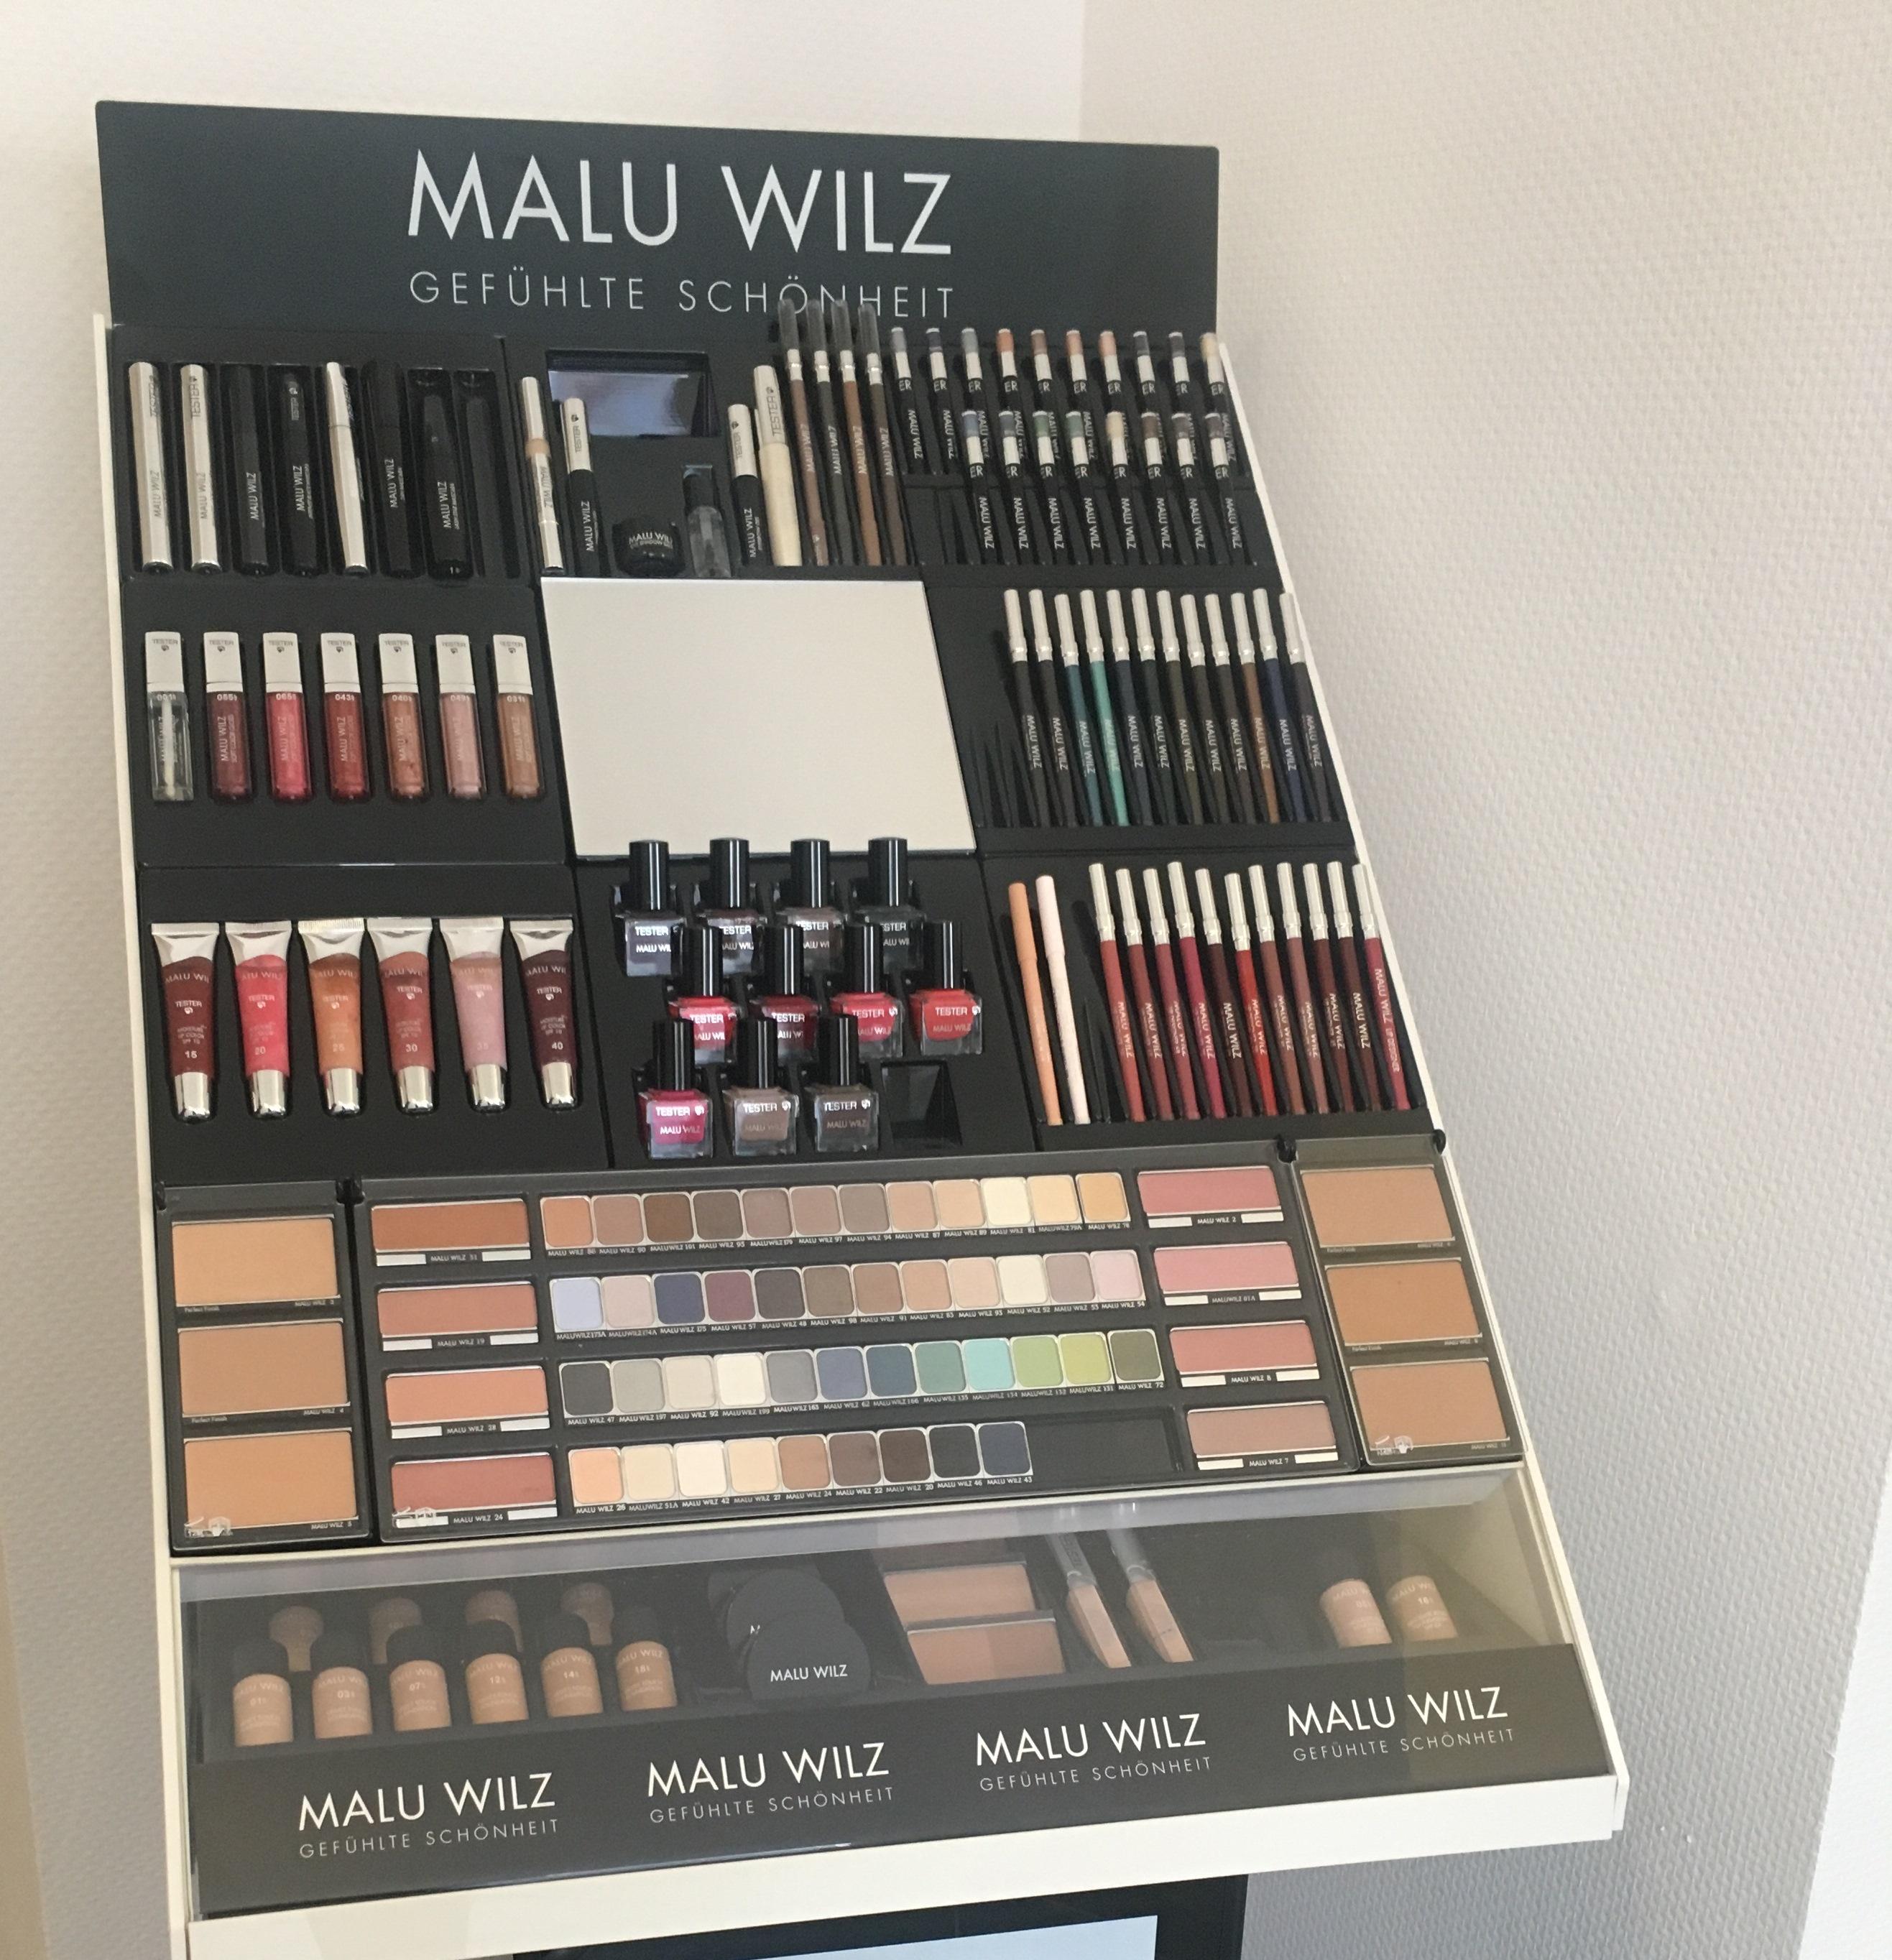 malu_wilz1